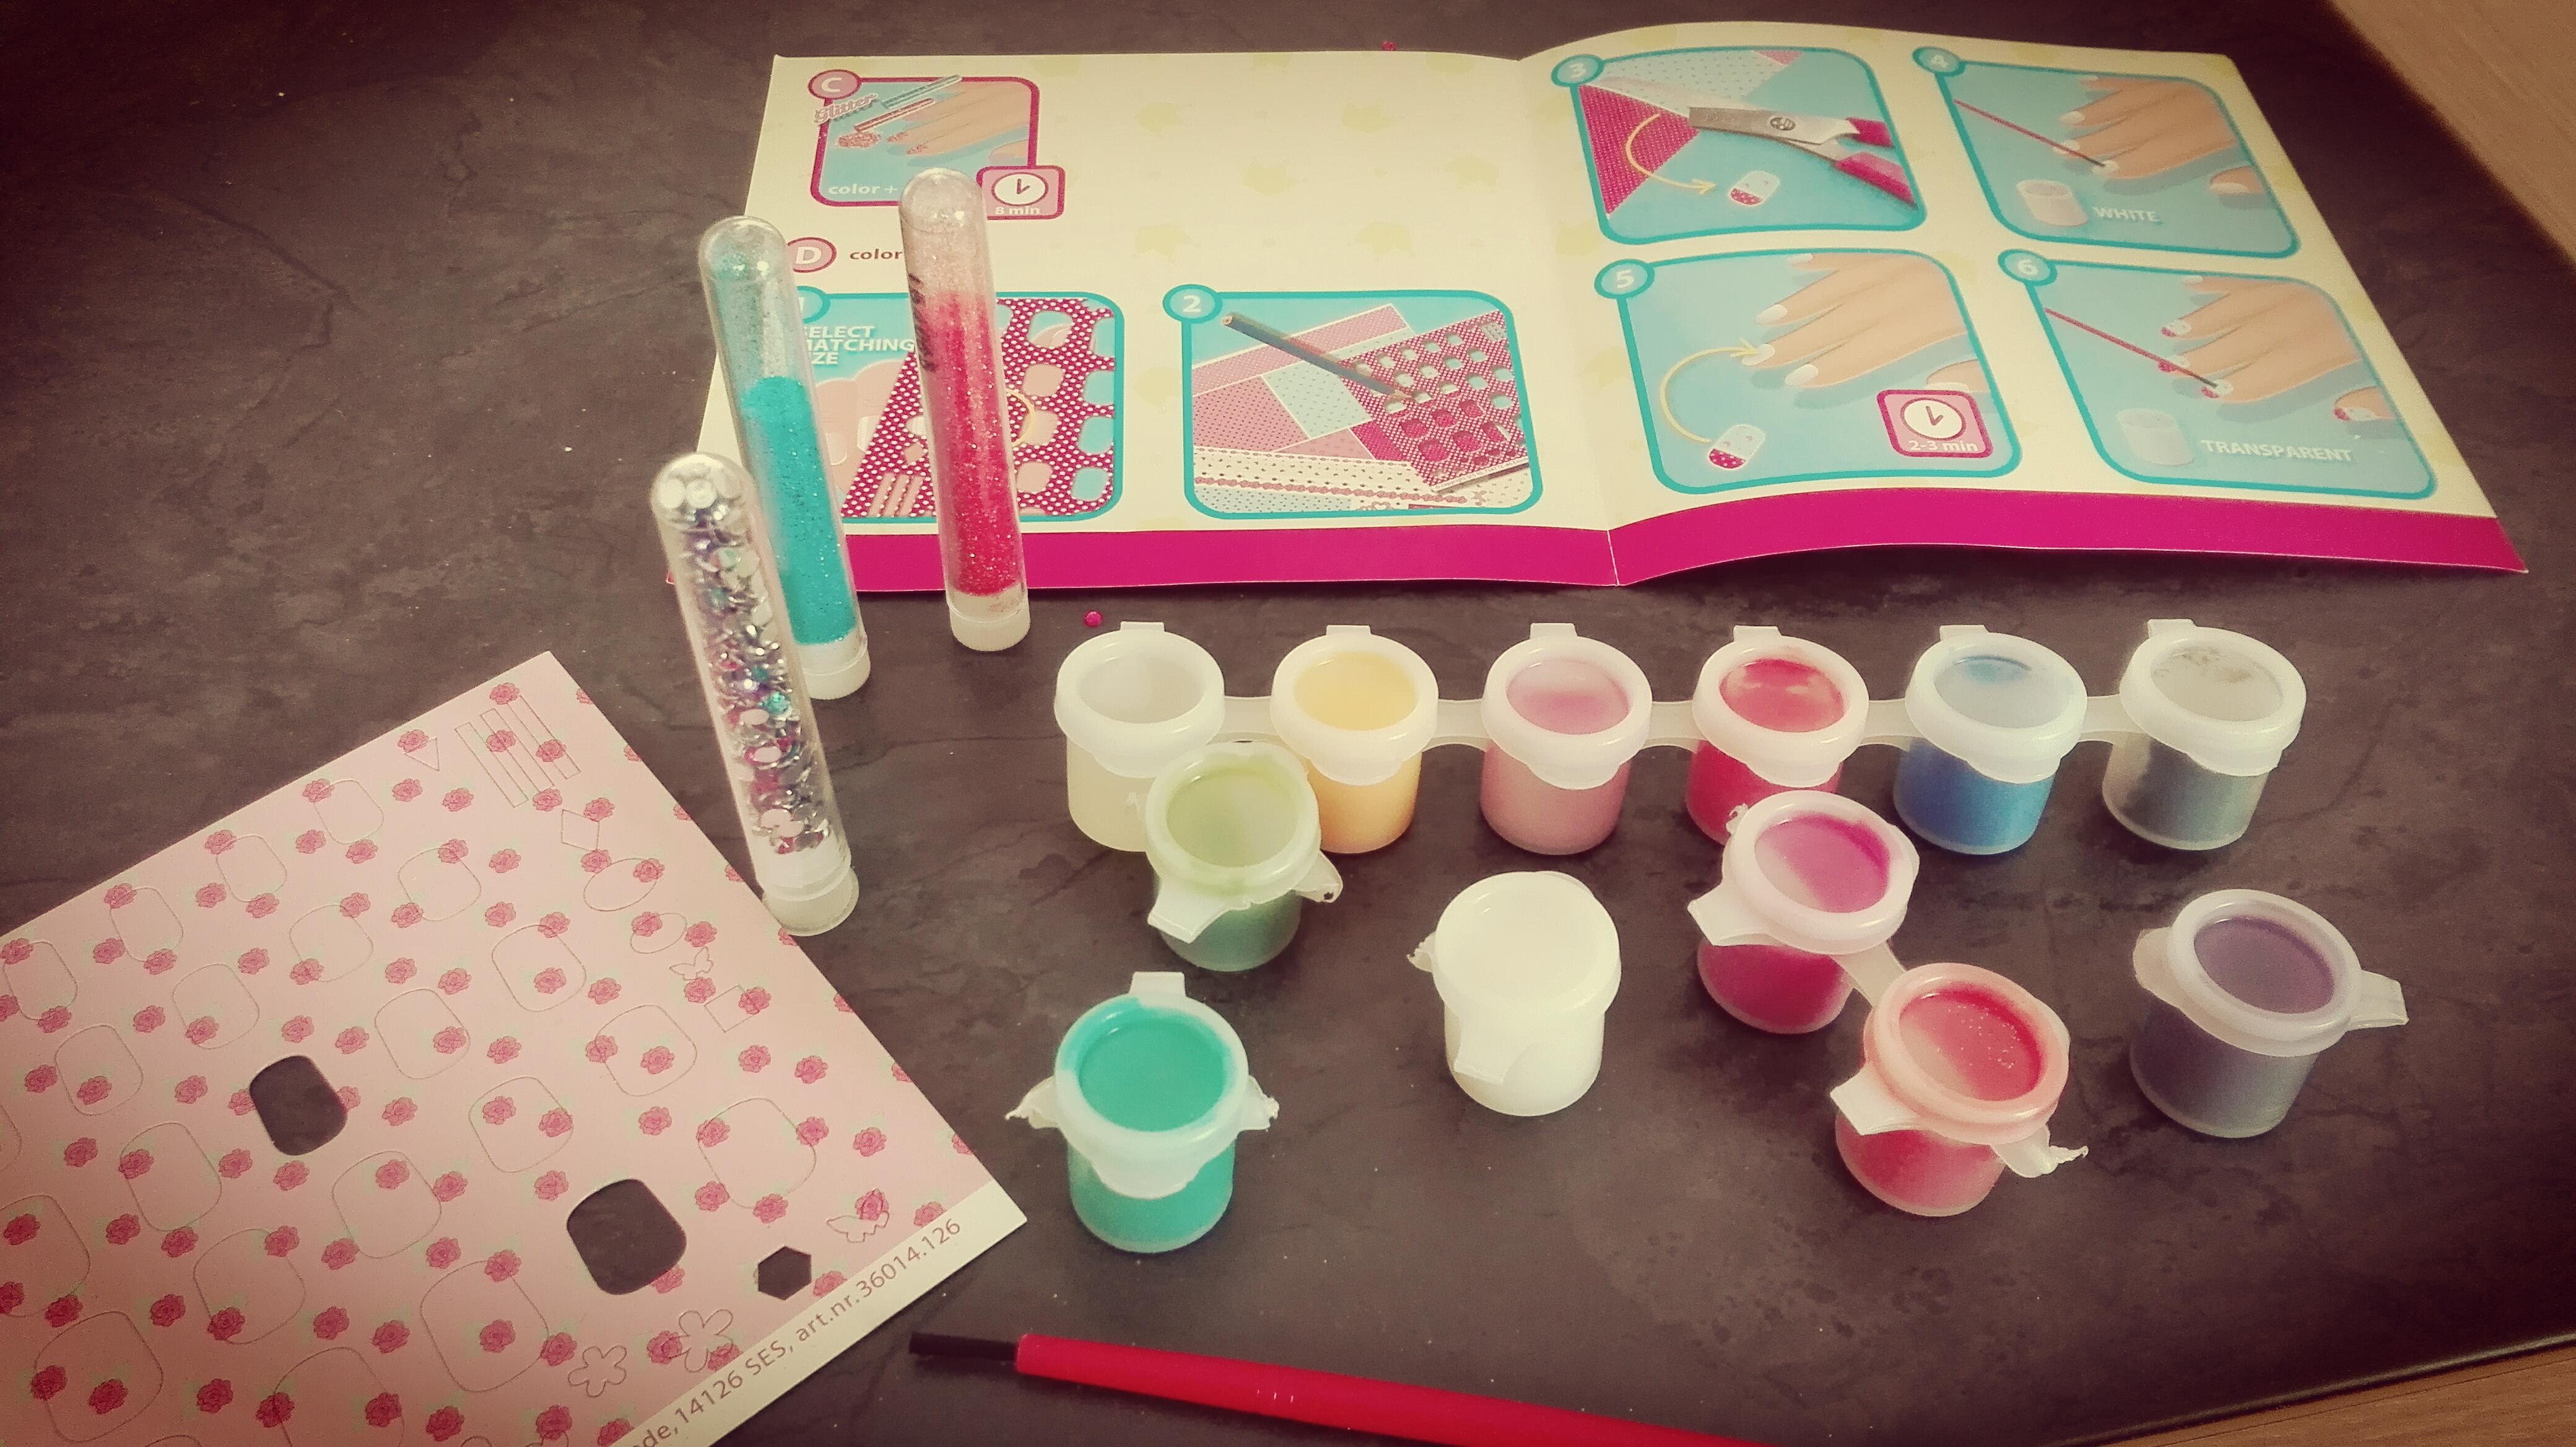 Ses Creative meisjes knutselen nagels versieren nagellak voor kinderen glitters instructieboekje nanny annelon meiden middag lekker friemelen en mooi make5